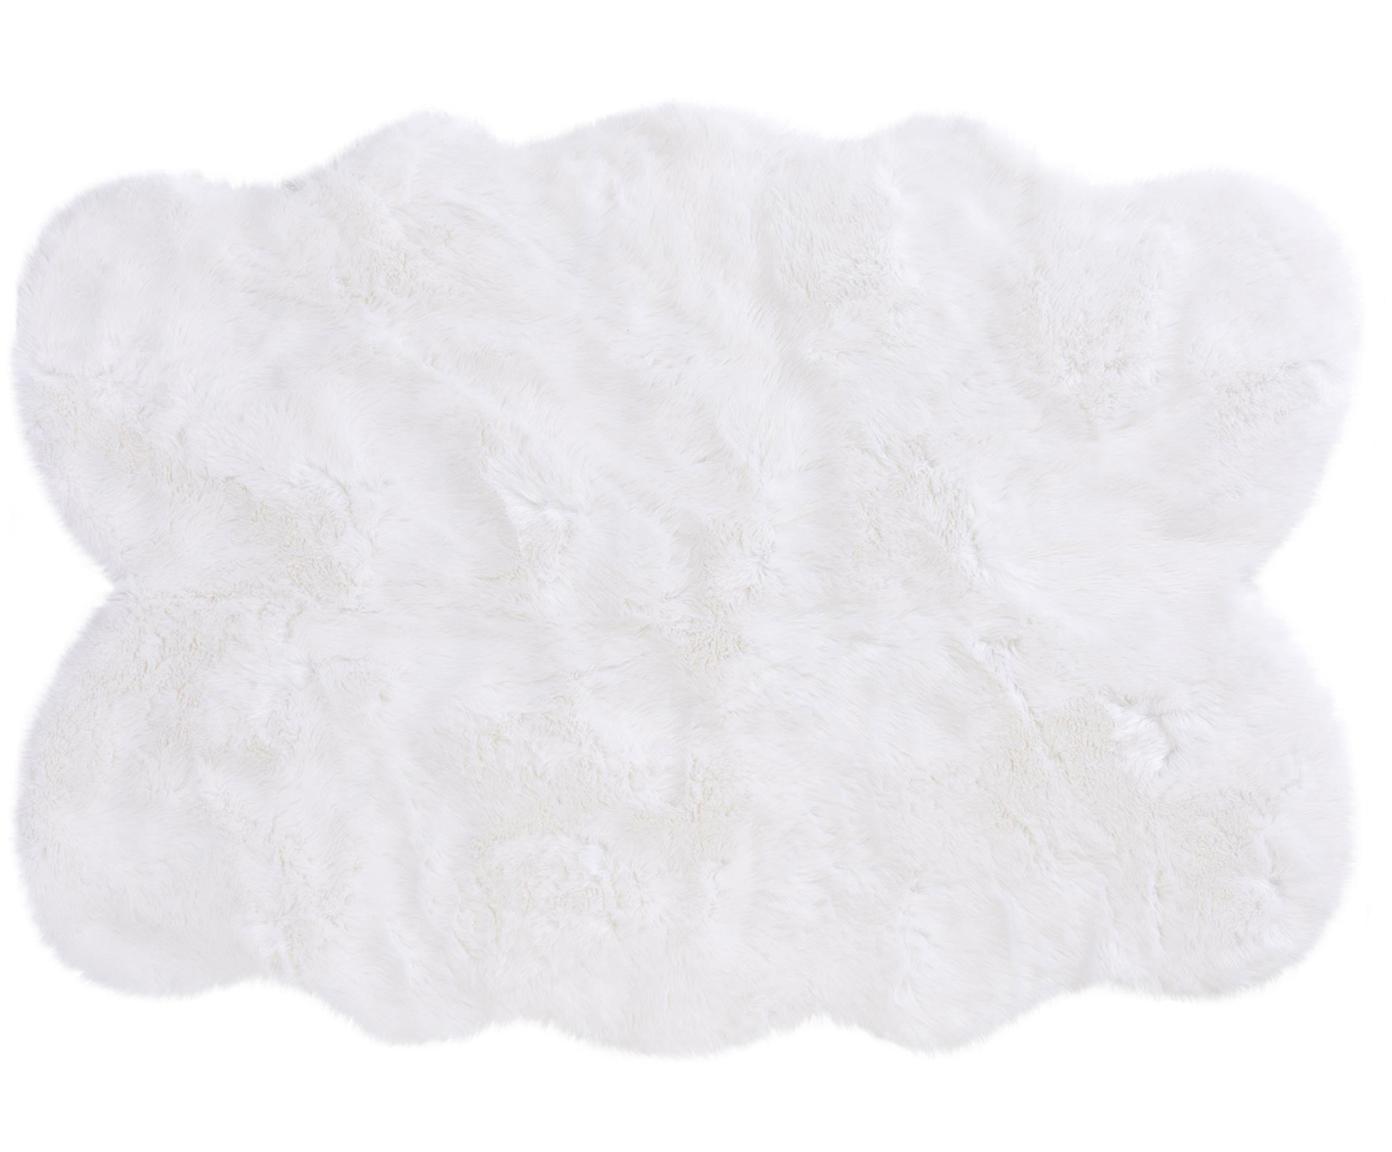 Imitatie schapenvacht Elmo, glad, Bovenzijde: 50% acryl, 50% polyester, Onderzijde: polyester, Wit, B 140 x L 200 cm (maat S)